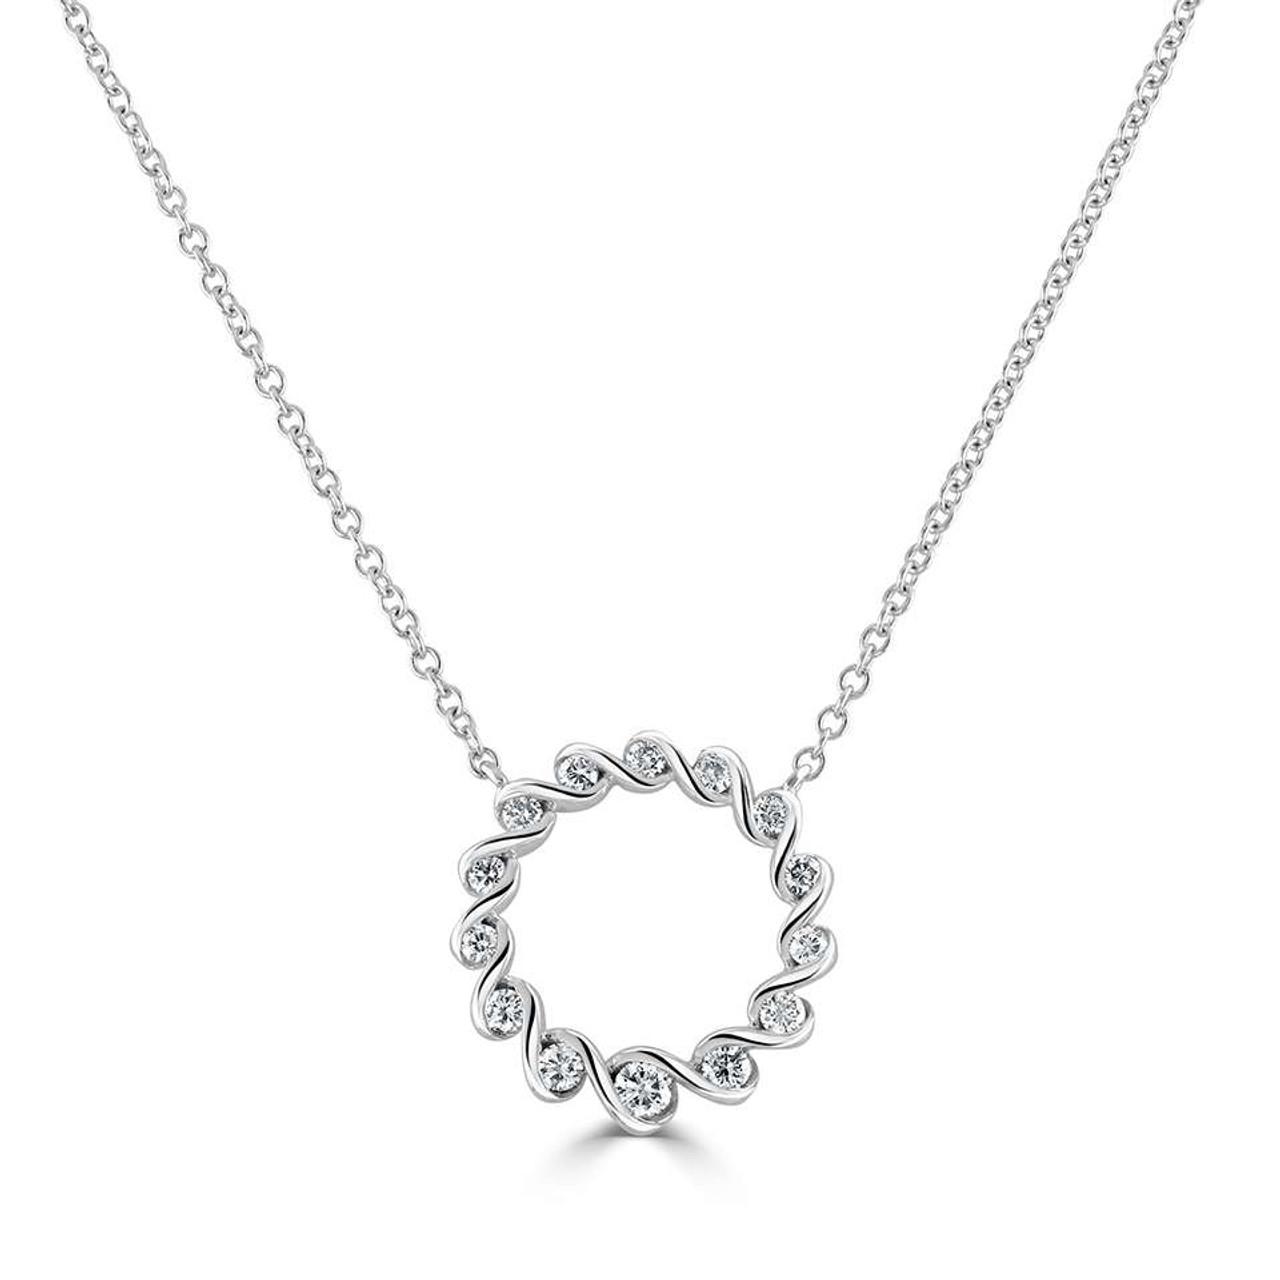 18ct White Gold Diamond Ribbon Necklace